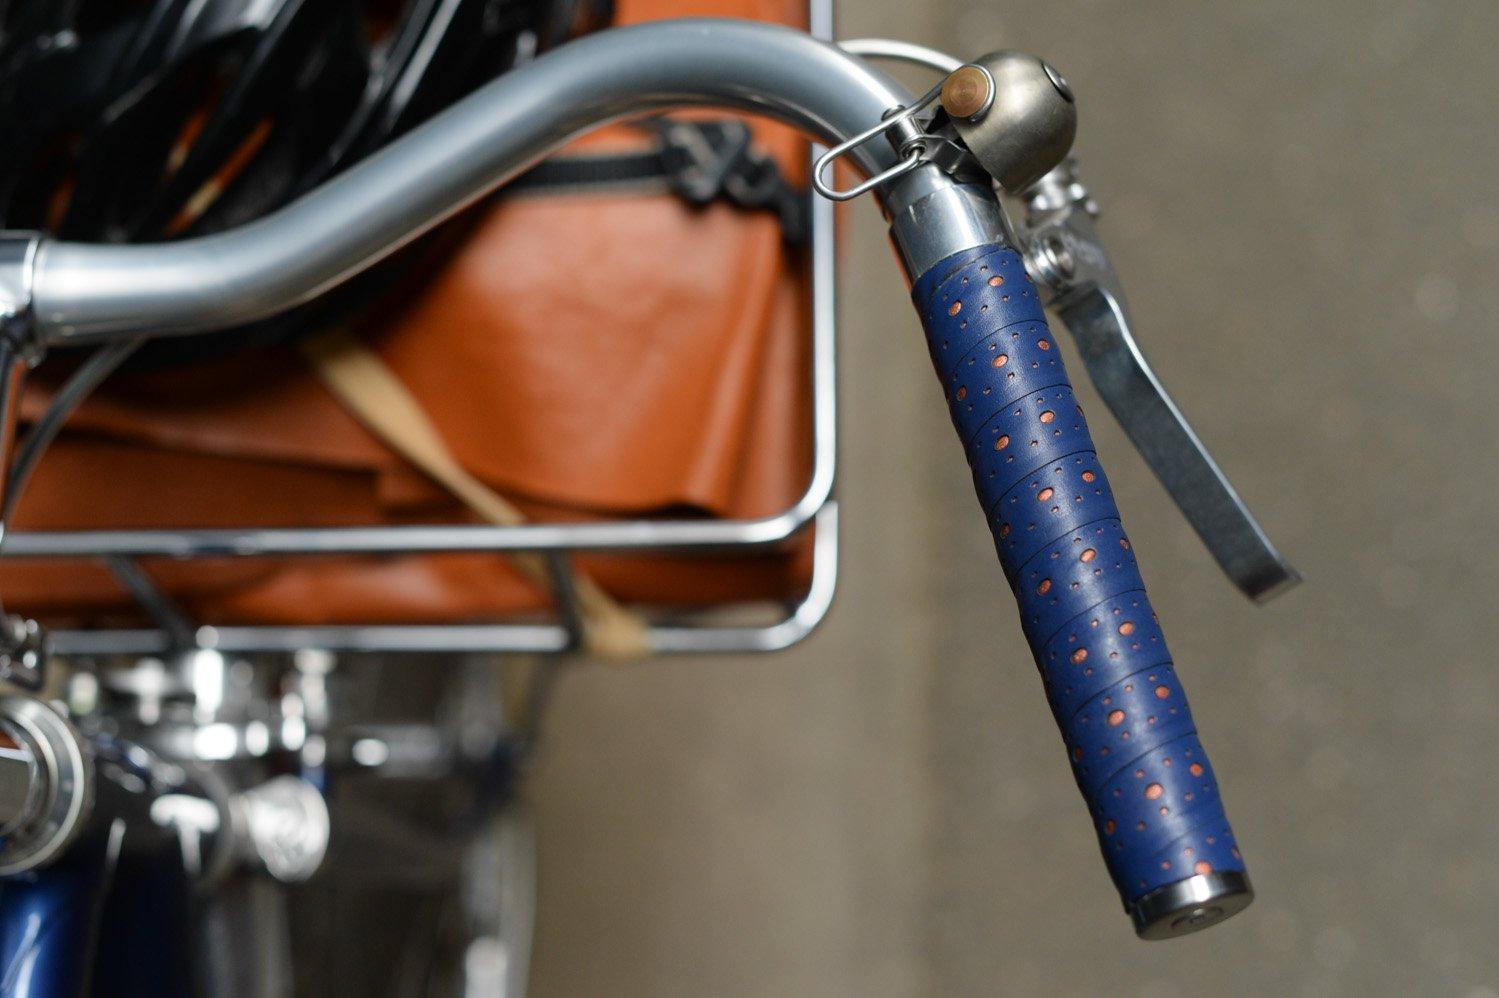 Fyxo Busyman Cycles Kumo Delivery Bike The Radavist